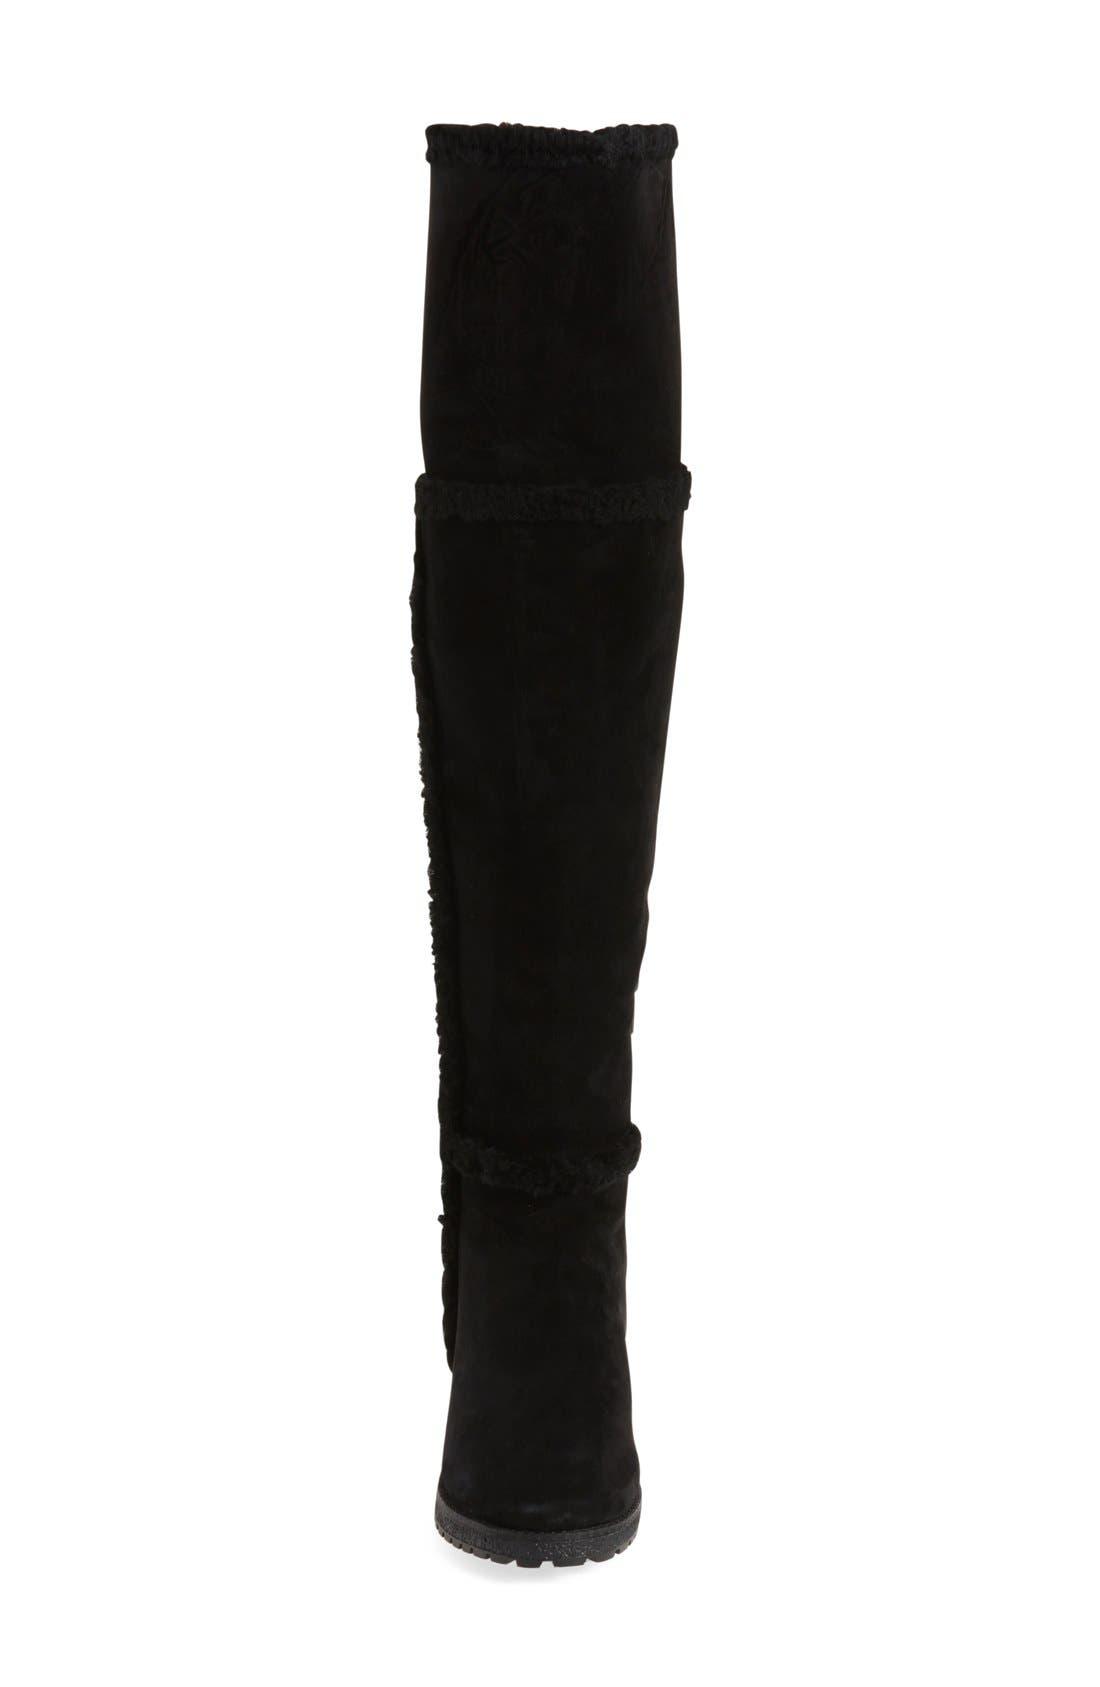 Alternate Image 3  - Frye 'Tamara' Genuine Shearling Over the Knee Boot (Women)